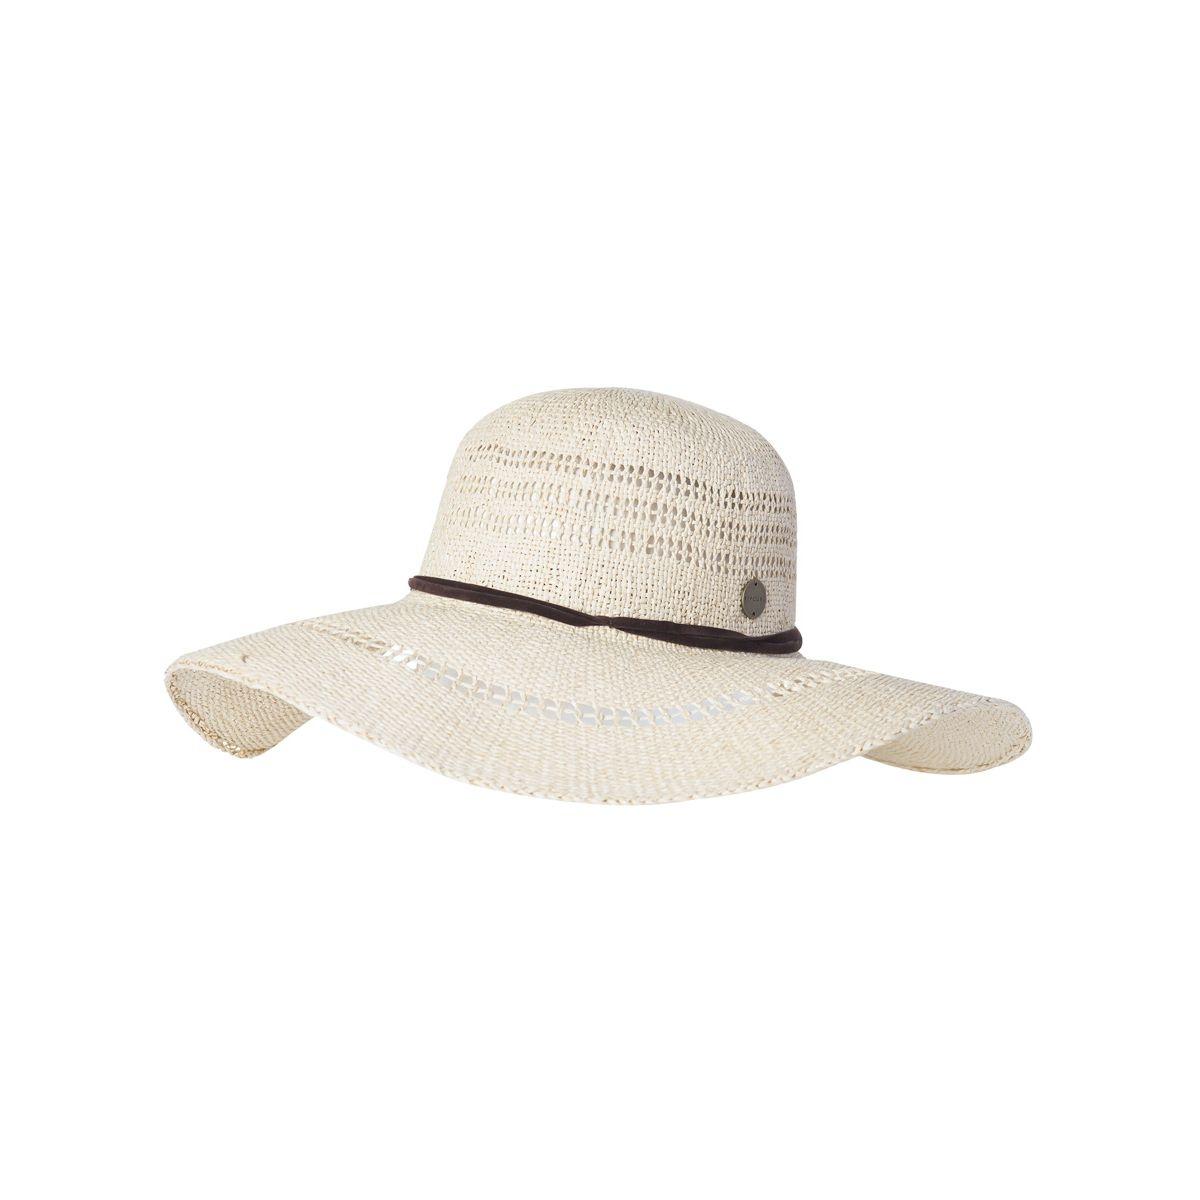 Chapeau de plage Ritual Boho